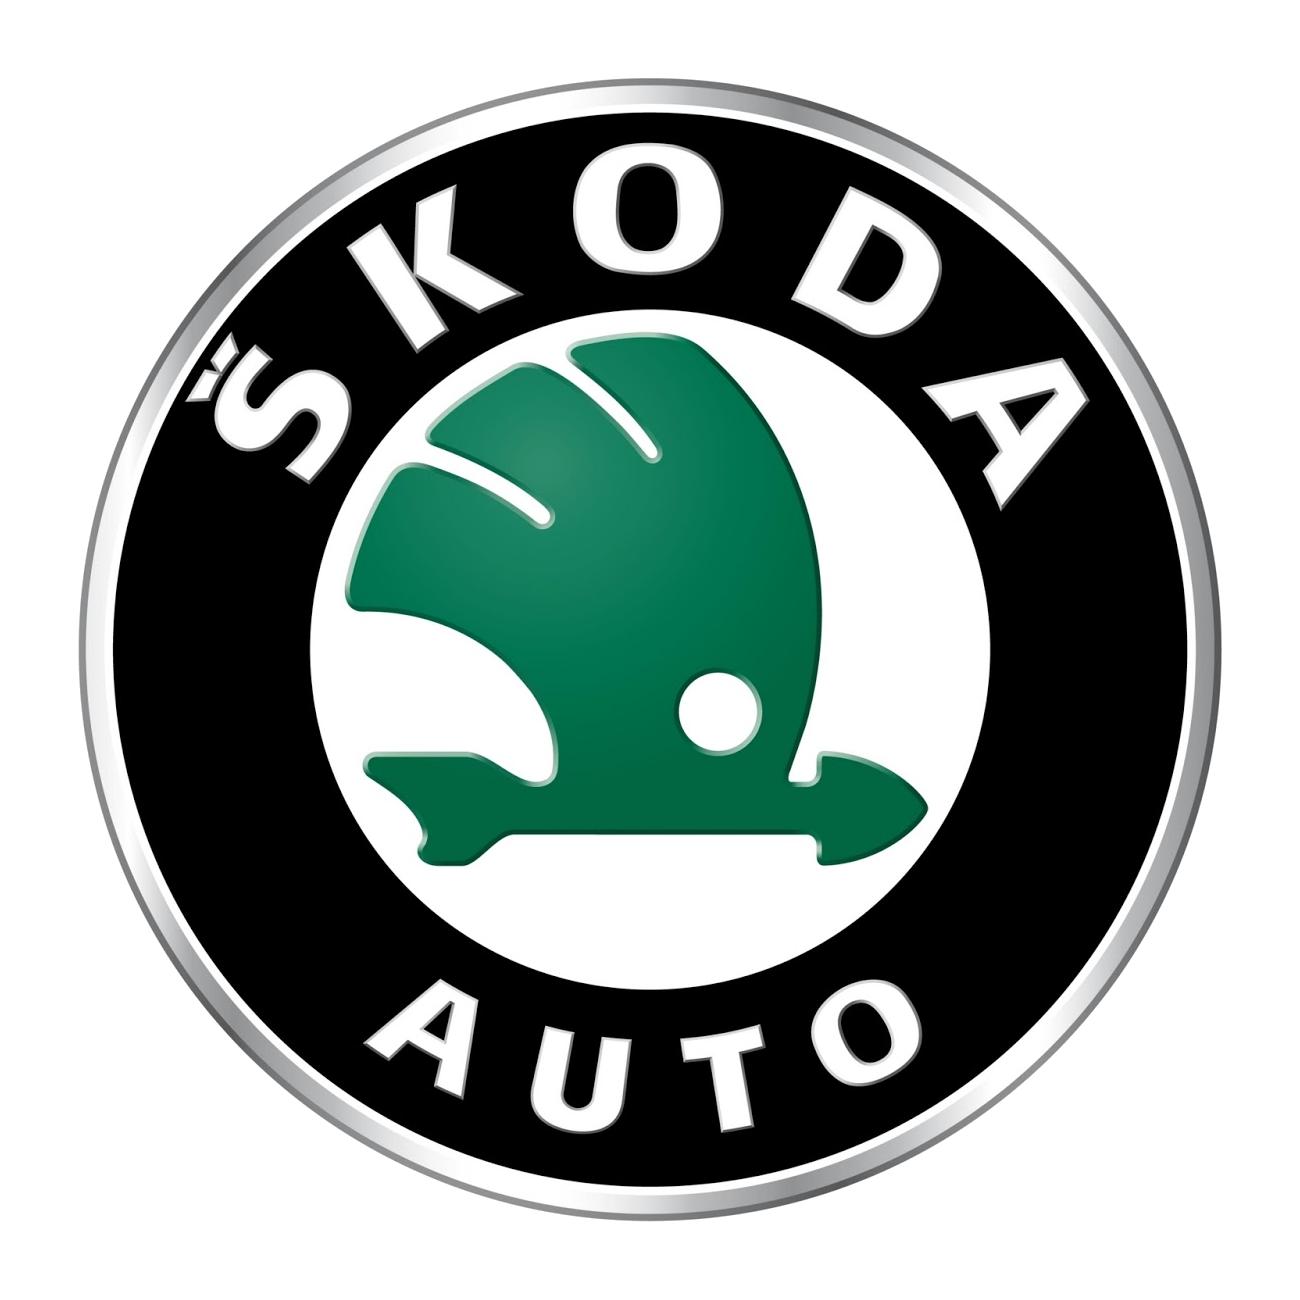 Skoda Car Logo PNG Image All car logos, Car logos, Skoda